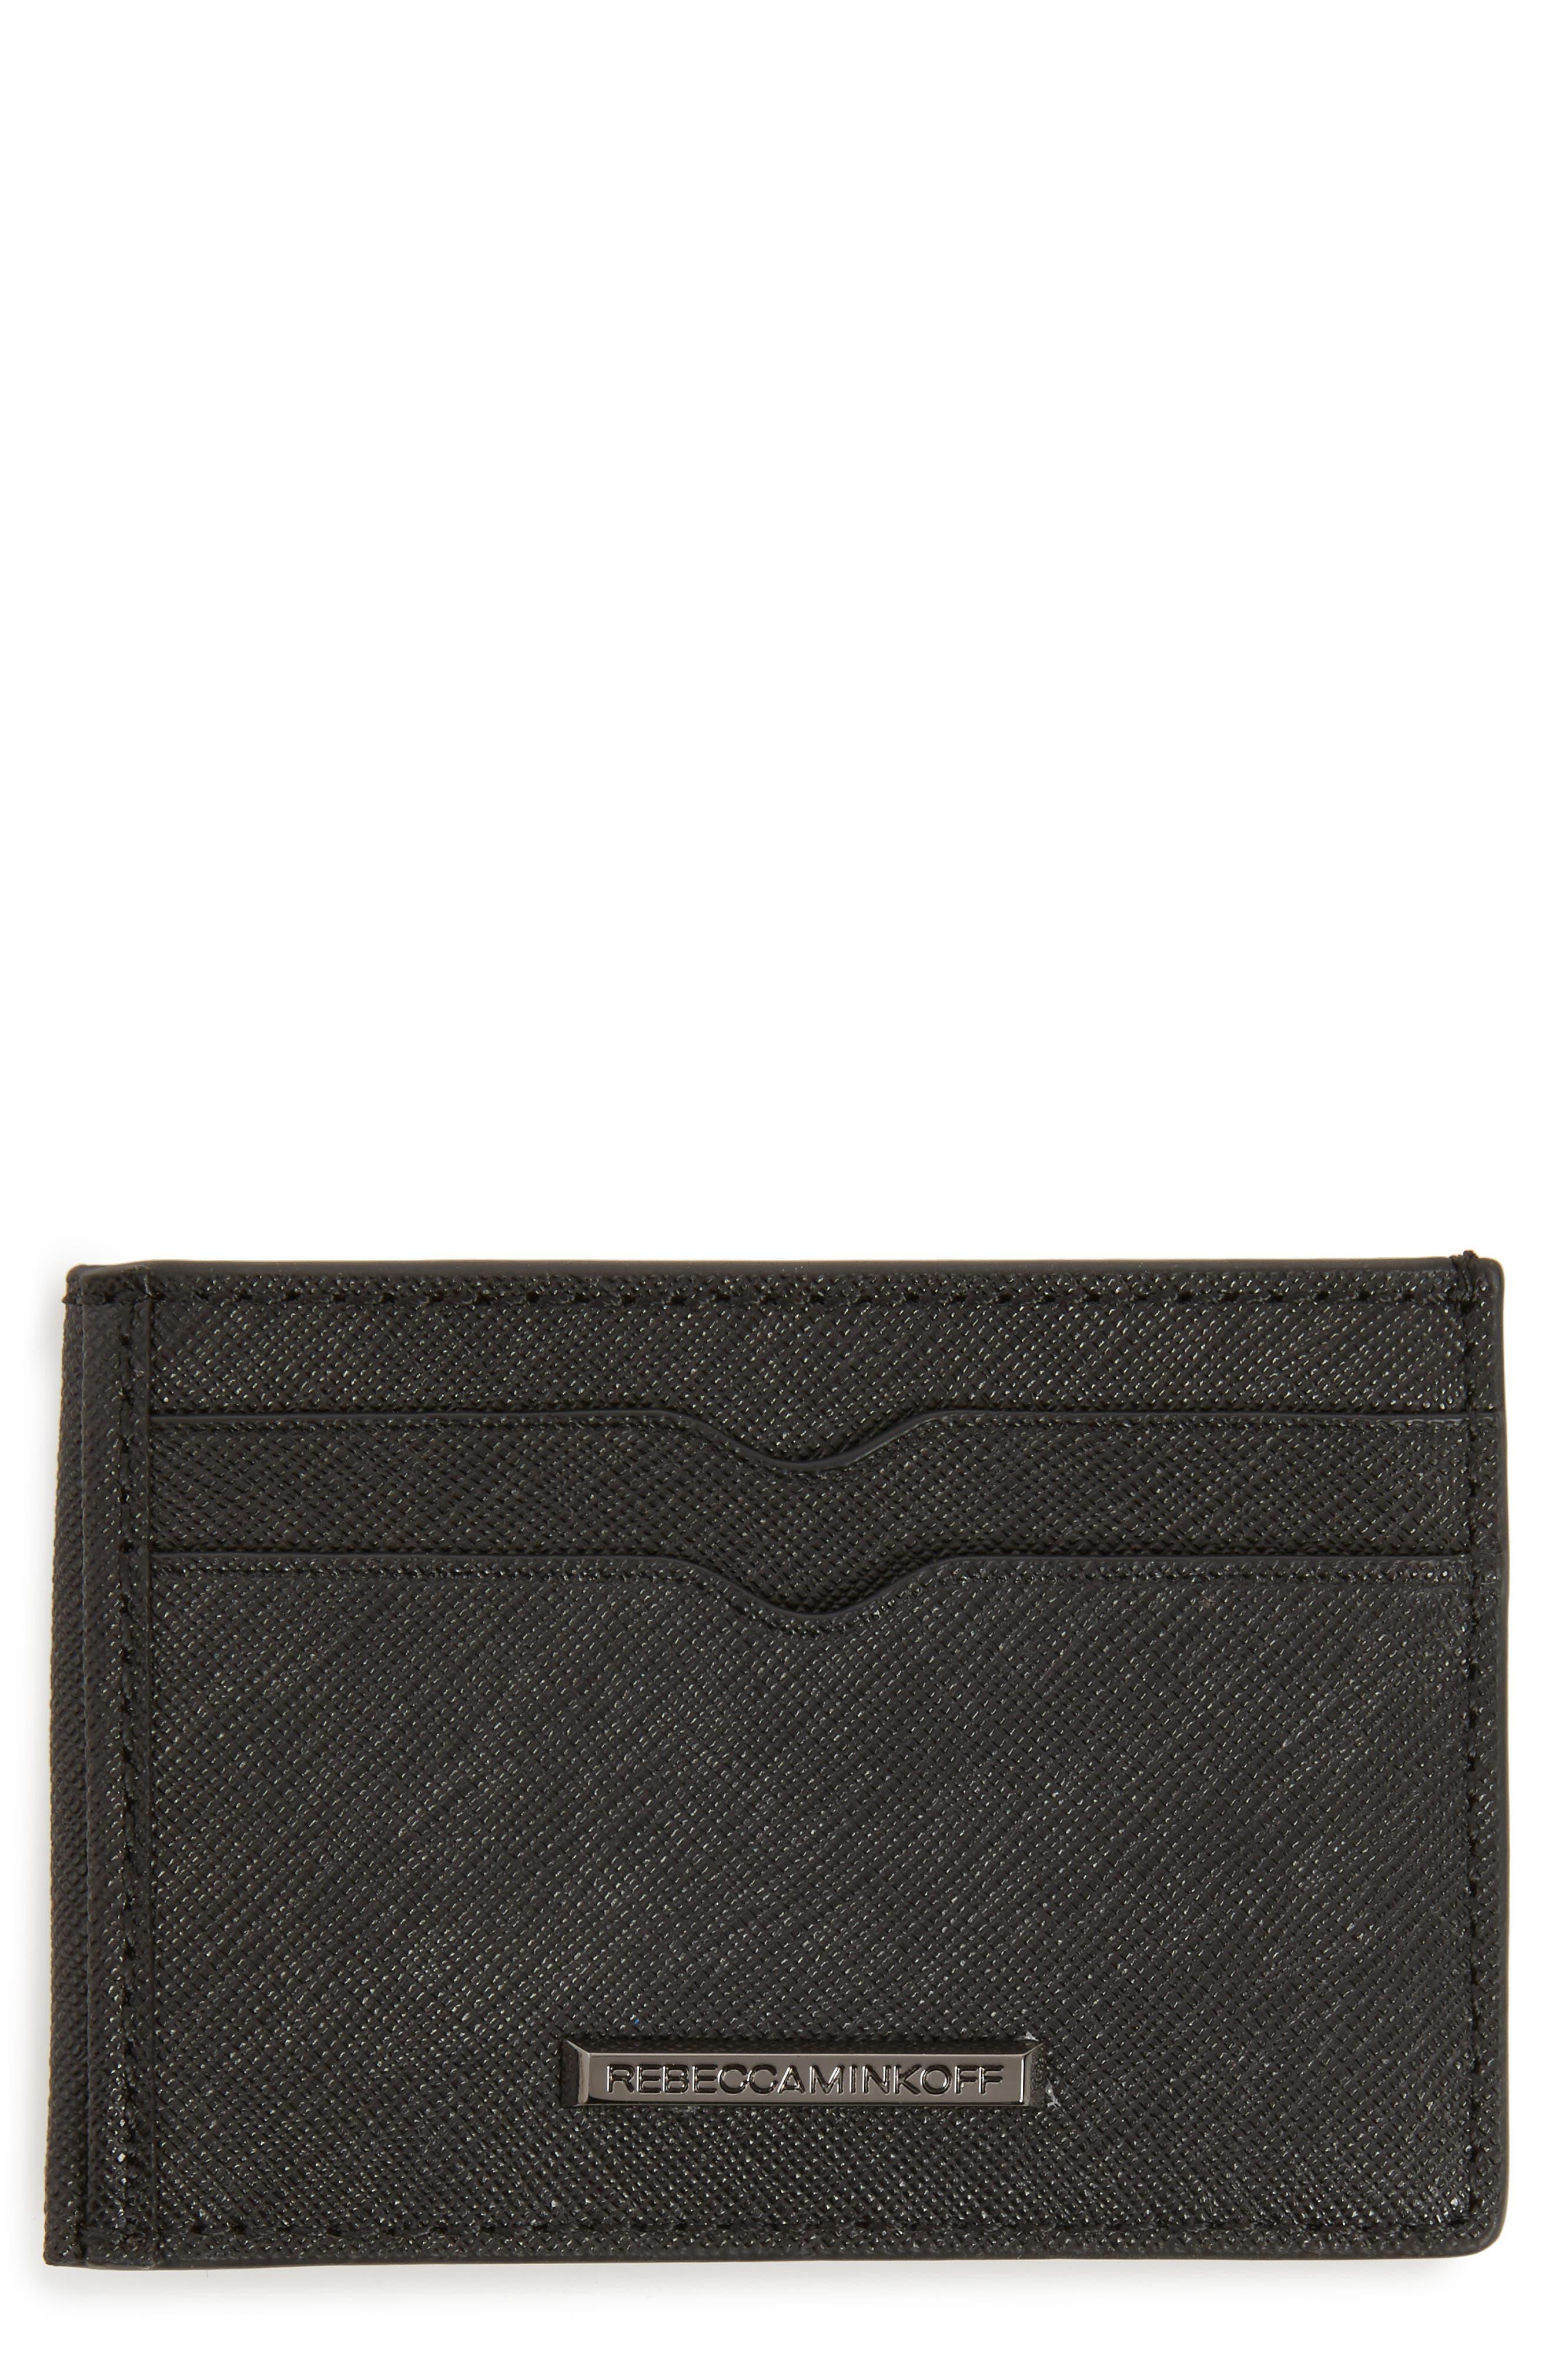 Main Image - Rebecca Minkoff Metro Leather Card Case